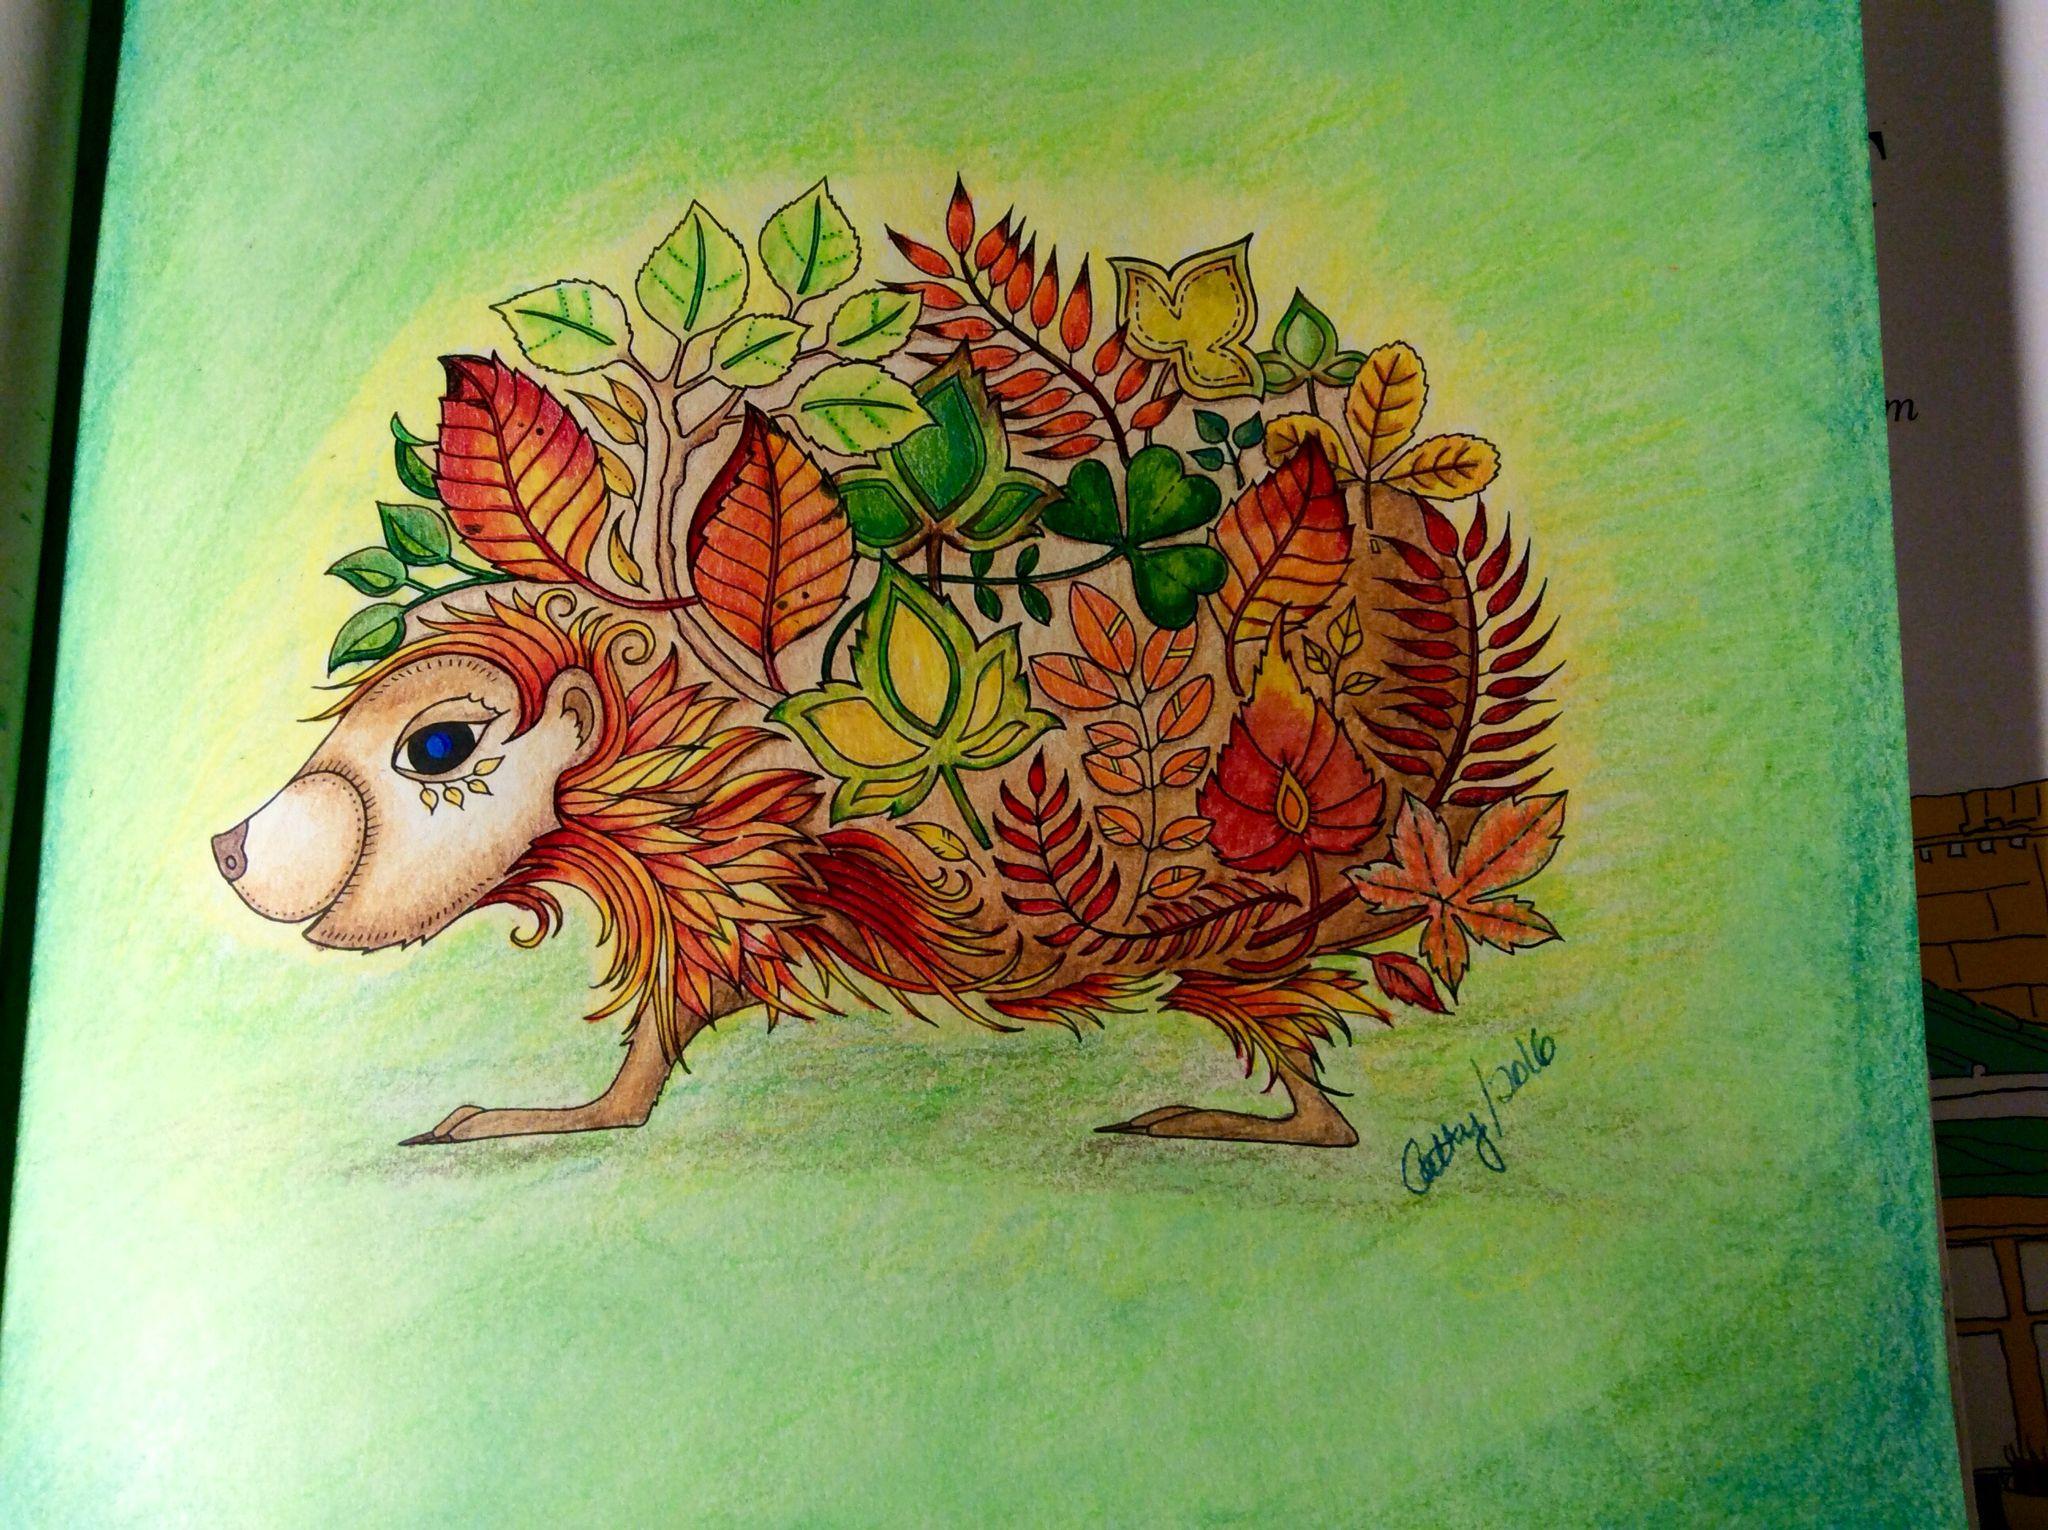 Hedgehog Enchanted Forest Johanna Basford Cathyc Pencil Crayons Coloring Book Art Enchanted Forest Coloring Johanna Basford Coloring Book